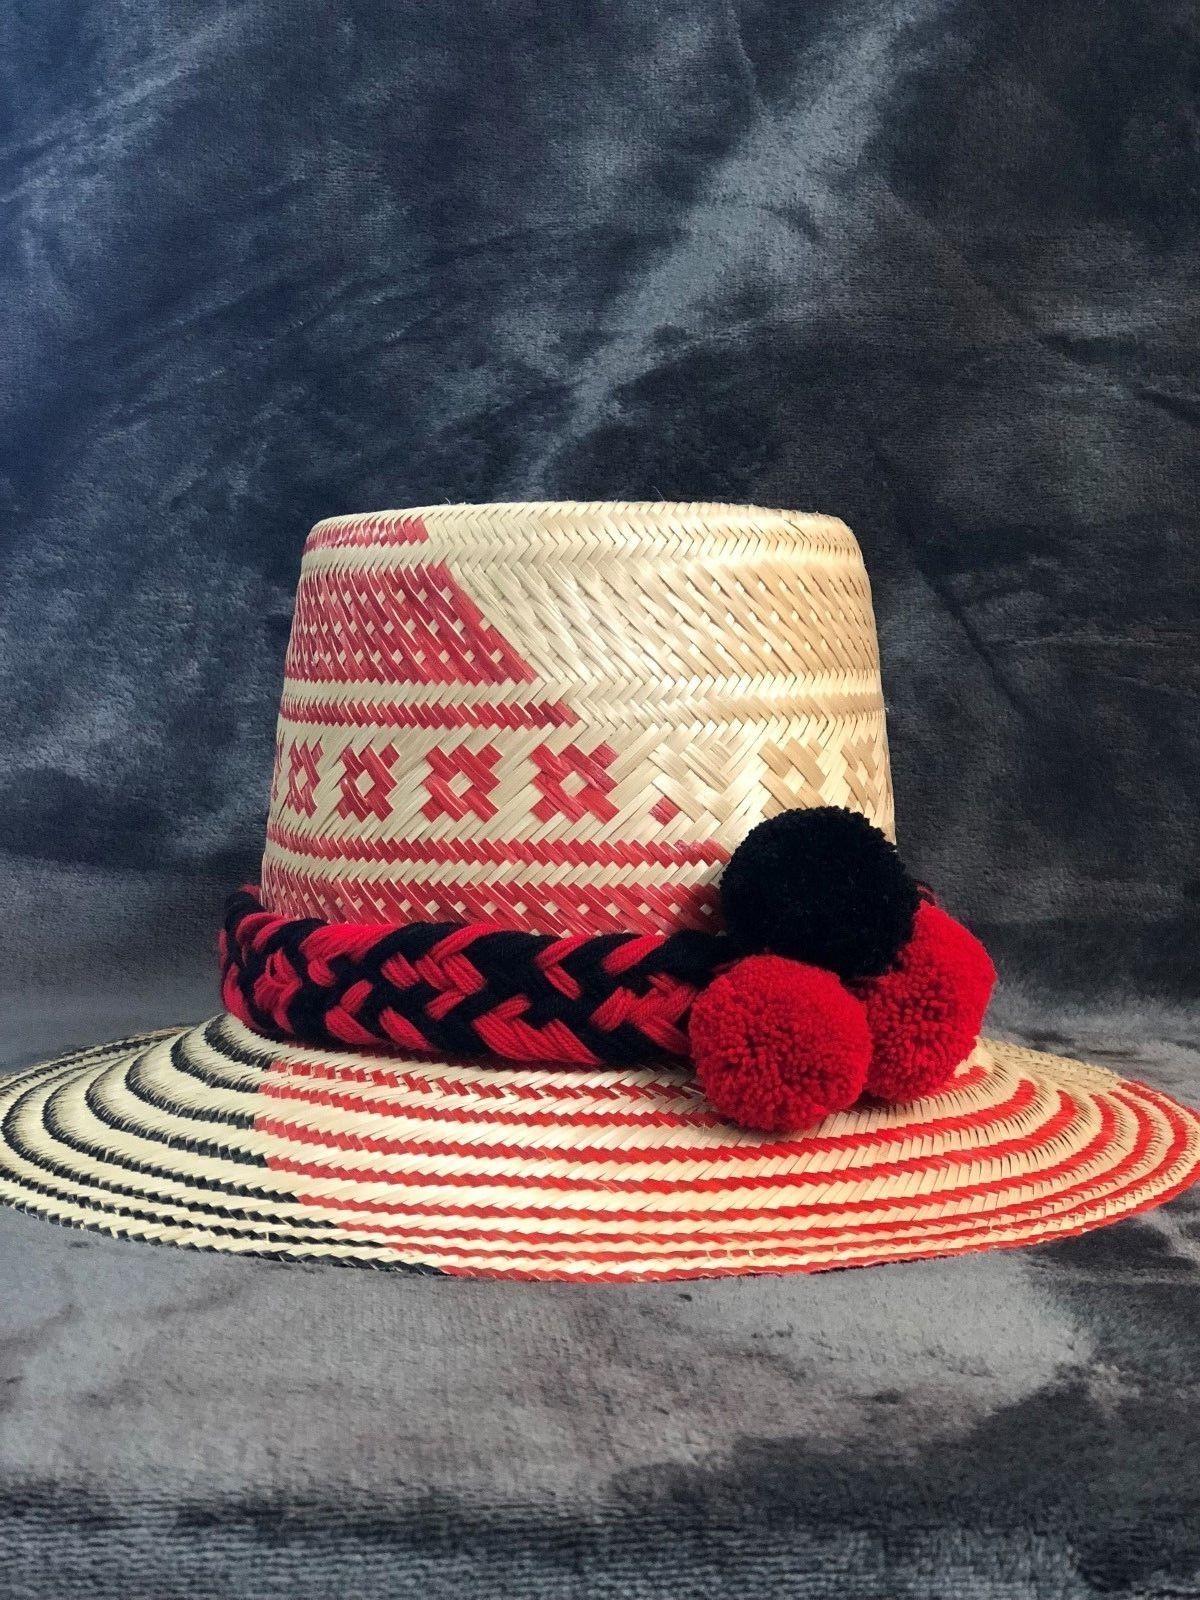 fb5e2059 ALL COLORS Wayuu Hat Woven Straw HandCrafted Stylish Pompom Panama Hat Sun  #wayuuhat #wayuu #straw #sunhat #summer #yosuzi #pom #summer2018 #trendy ...